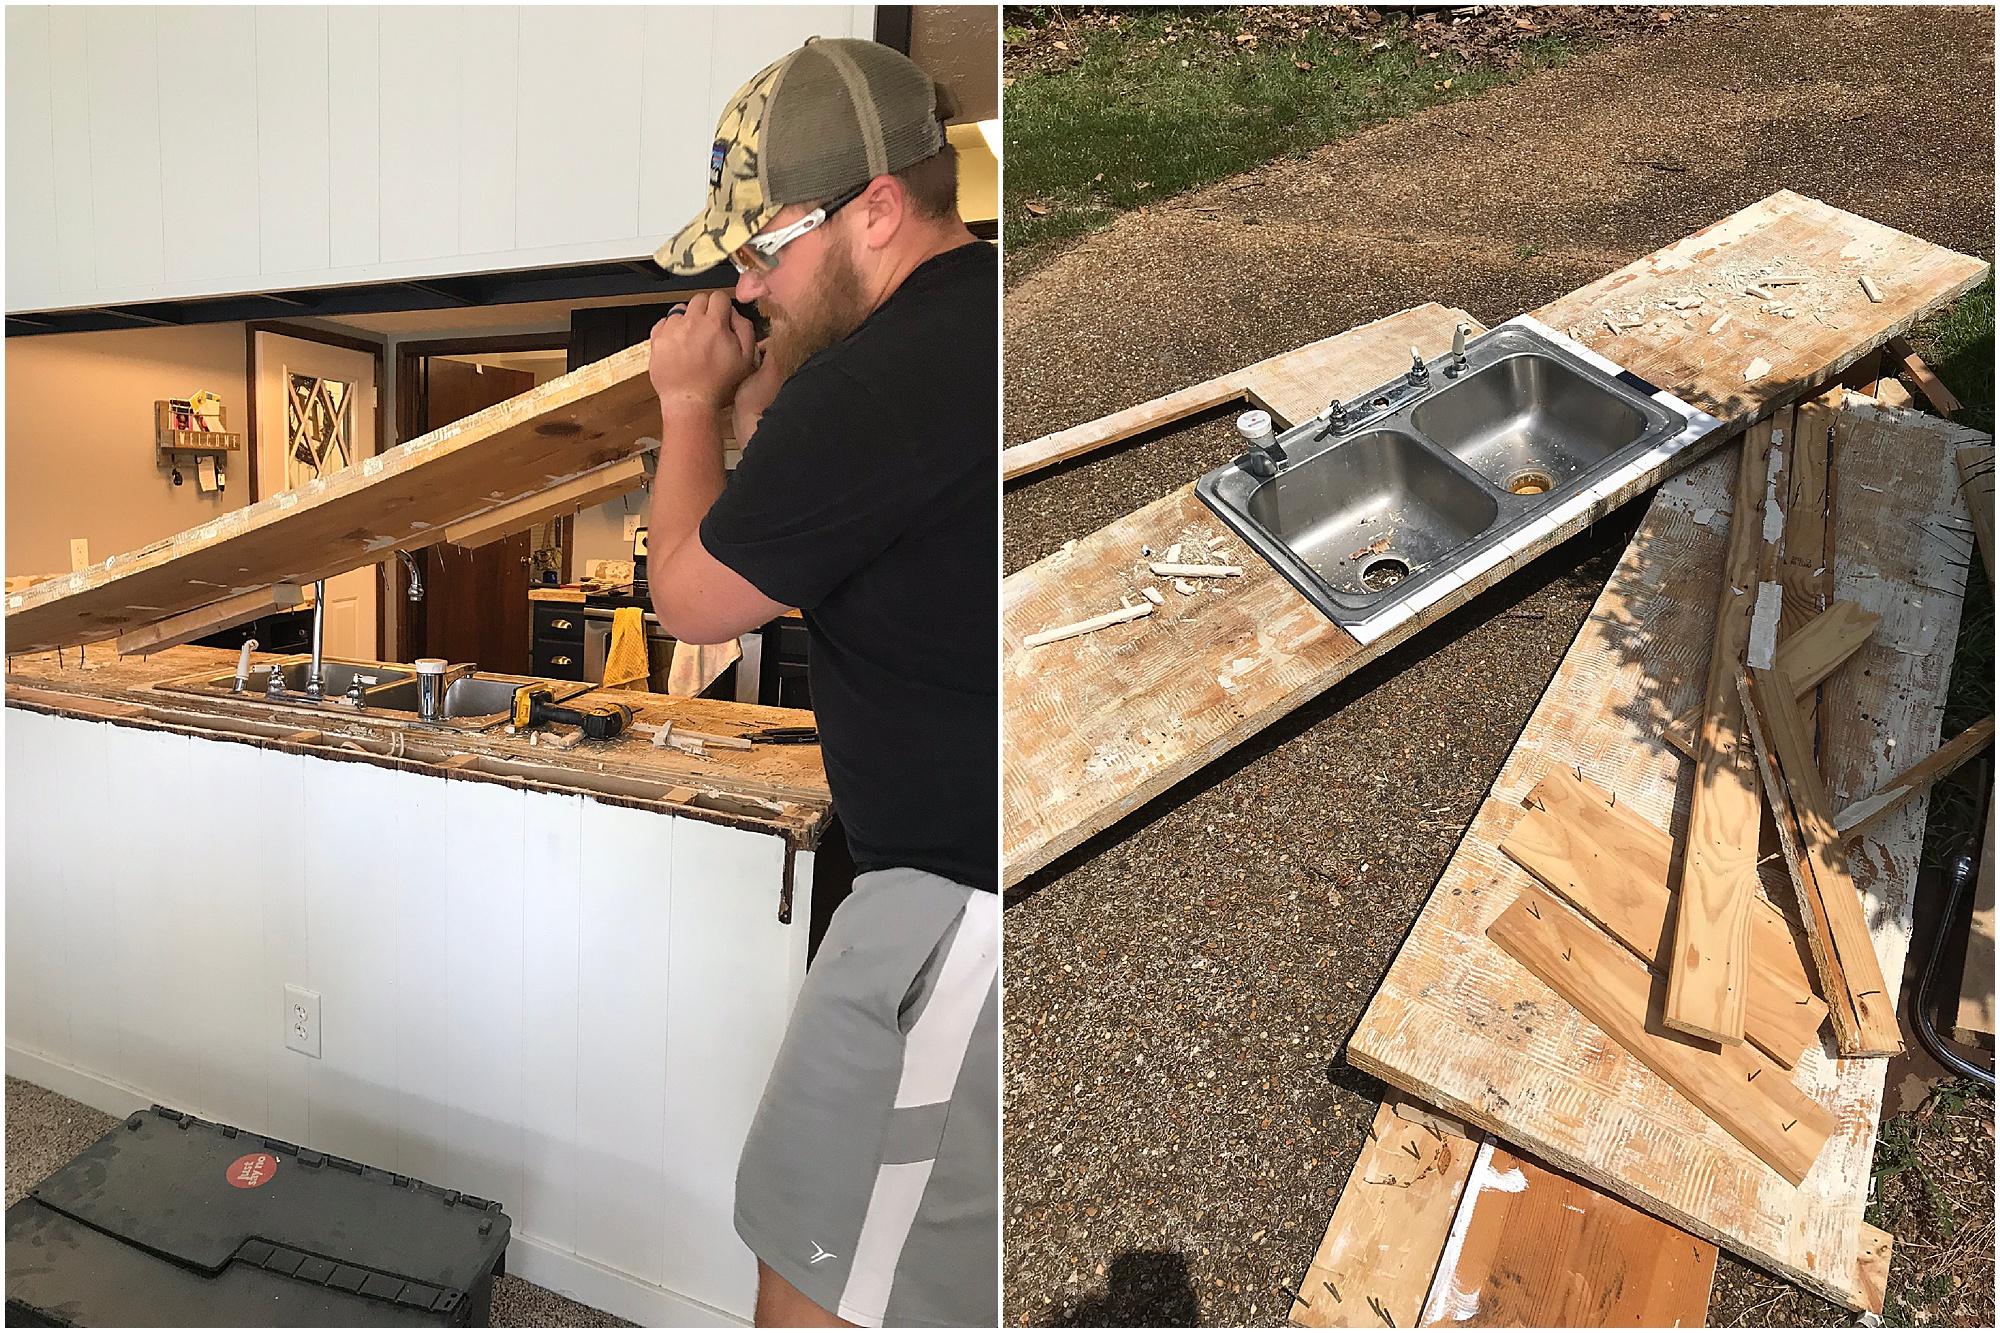 hambick-house-kitchen-renovation-fixer-upper_0007.jpg